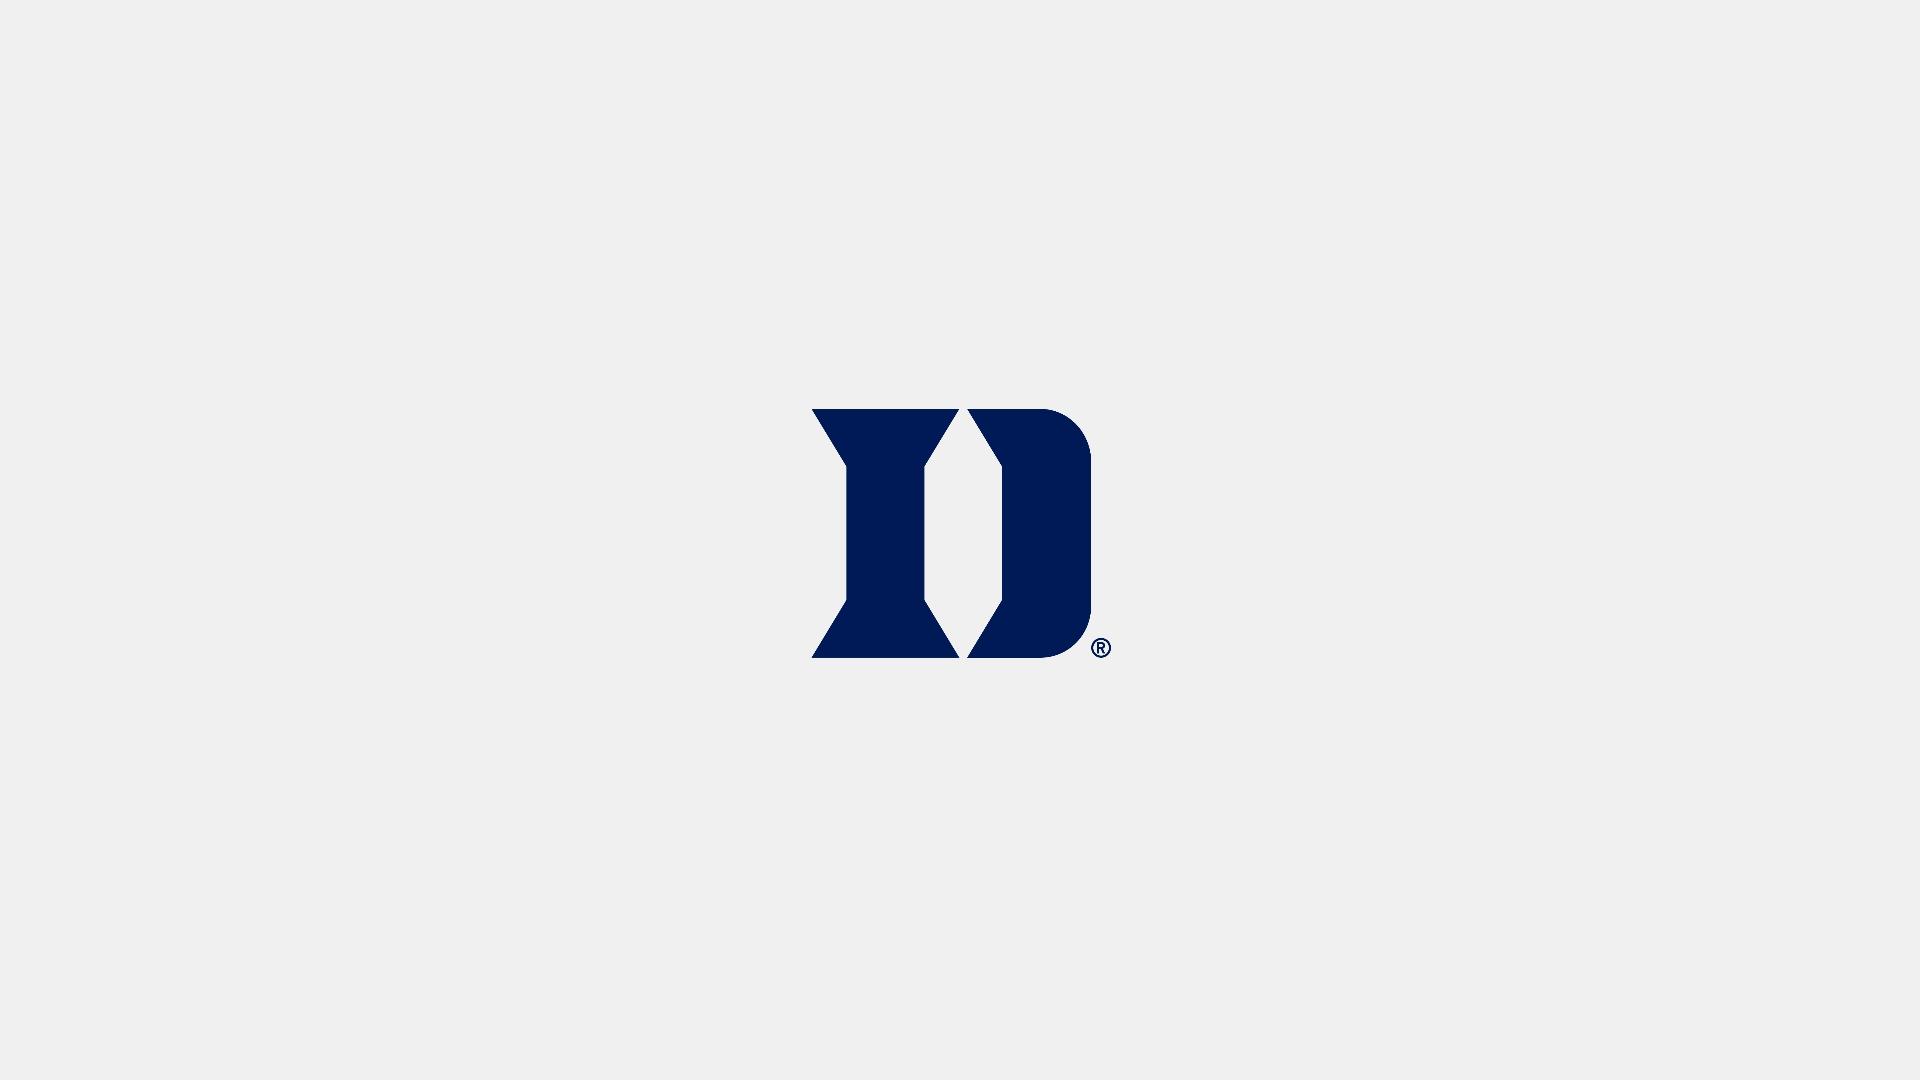 Duke Wallpapers (41 Wallpapers)